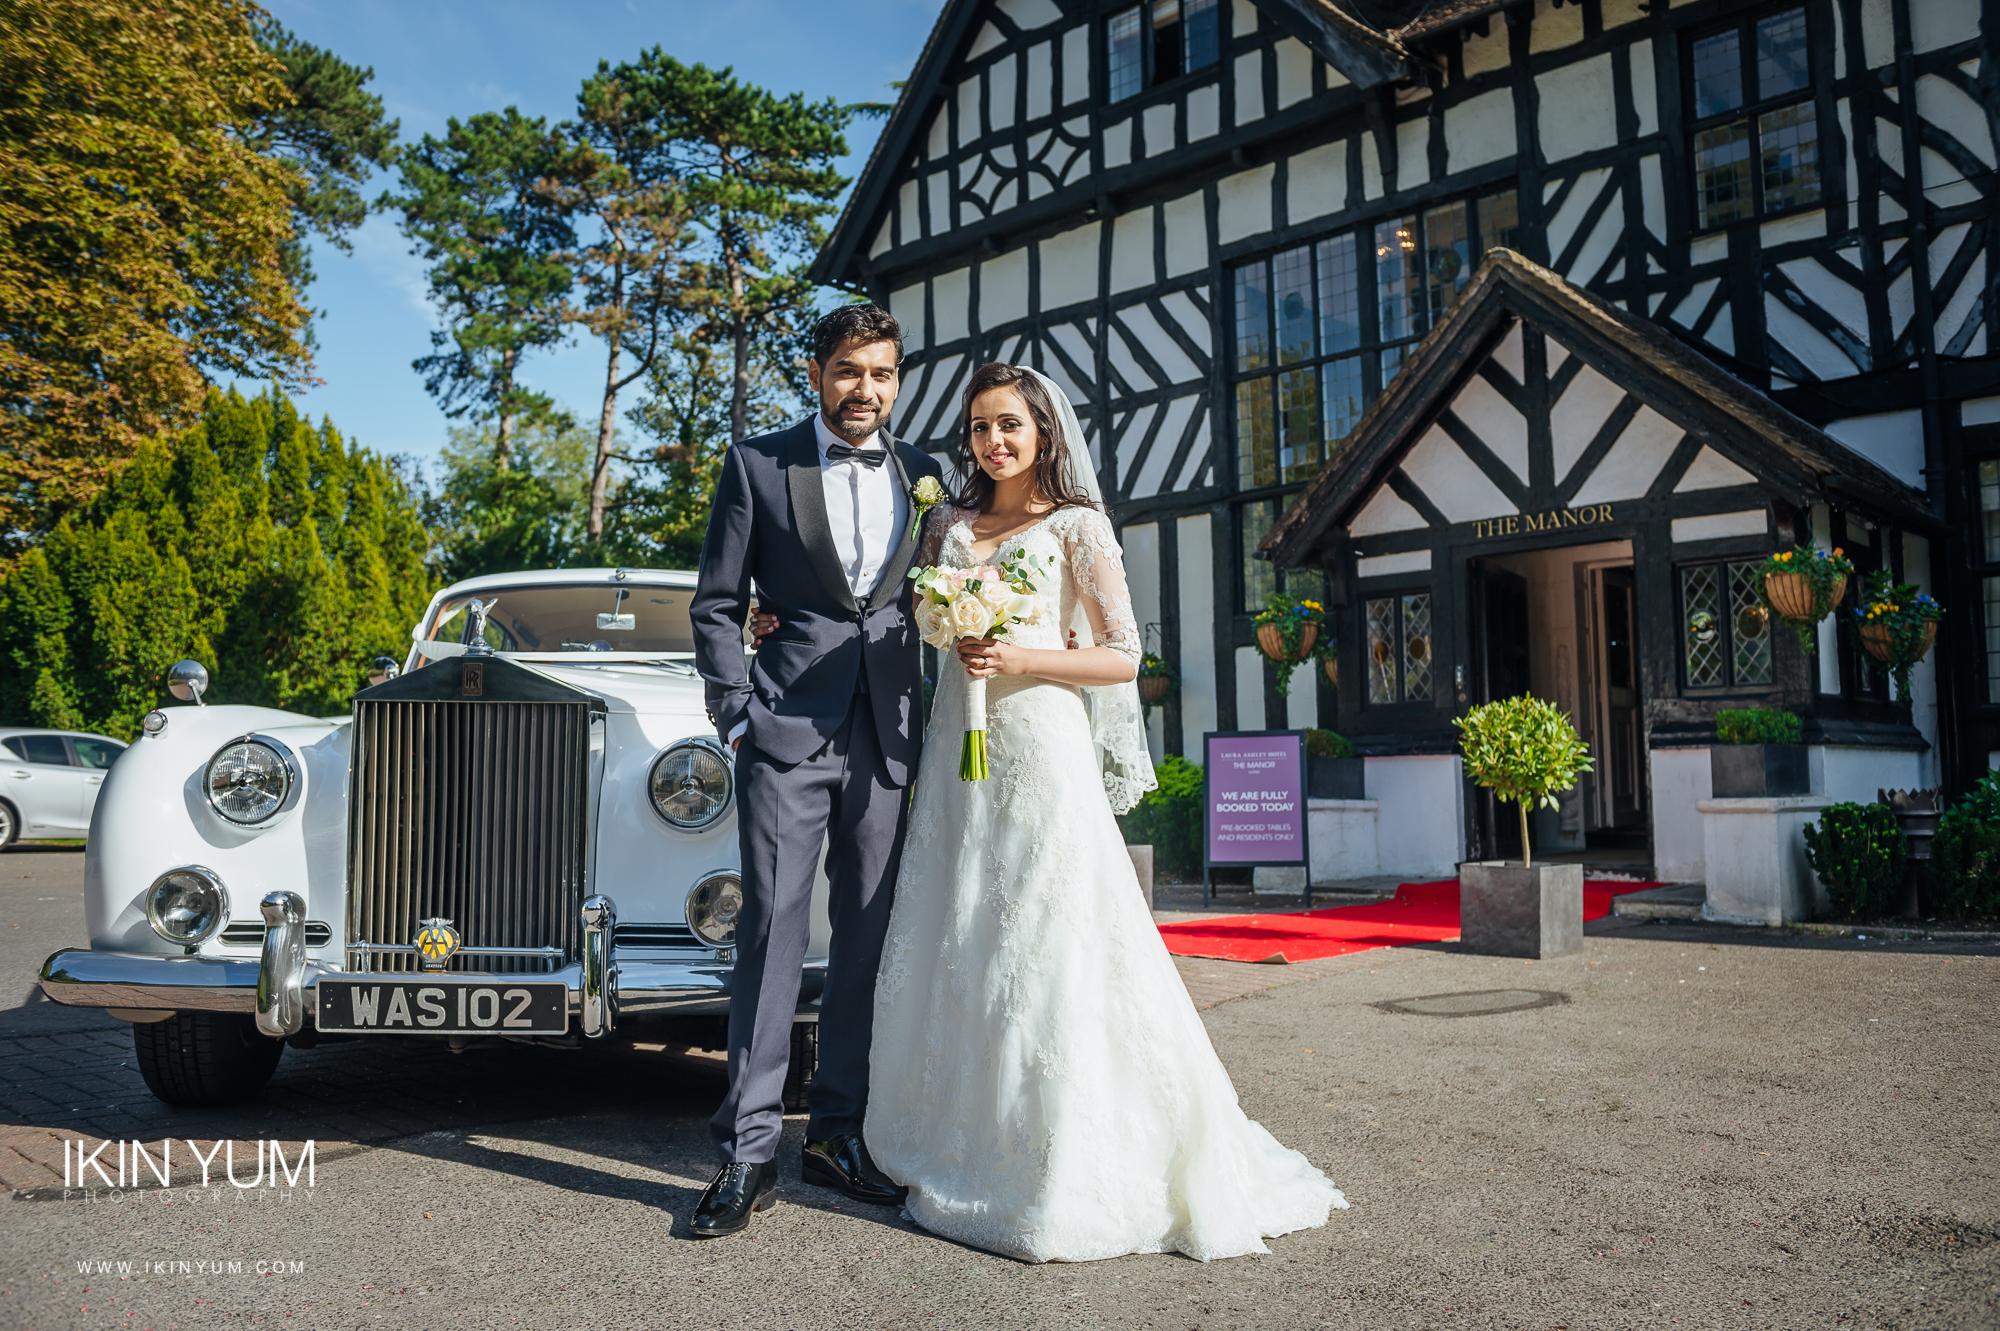 Laura Ashley Manor Wedding - Ikin Yum Photography-082.jpg